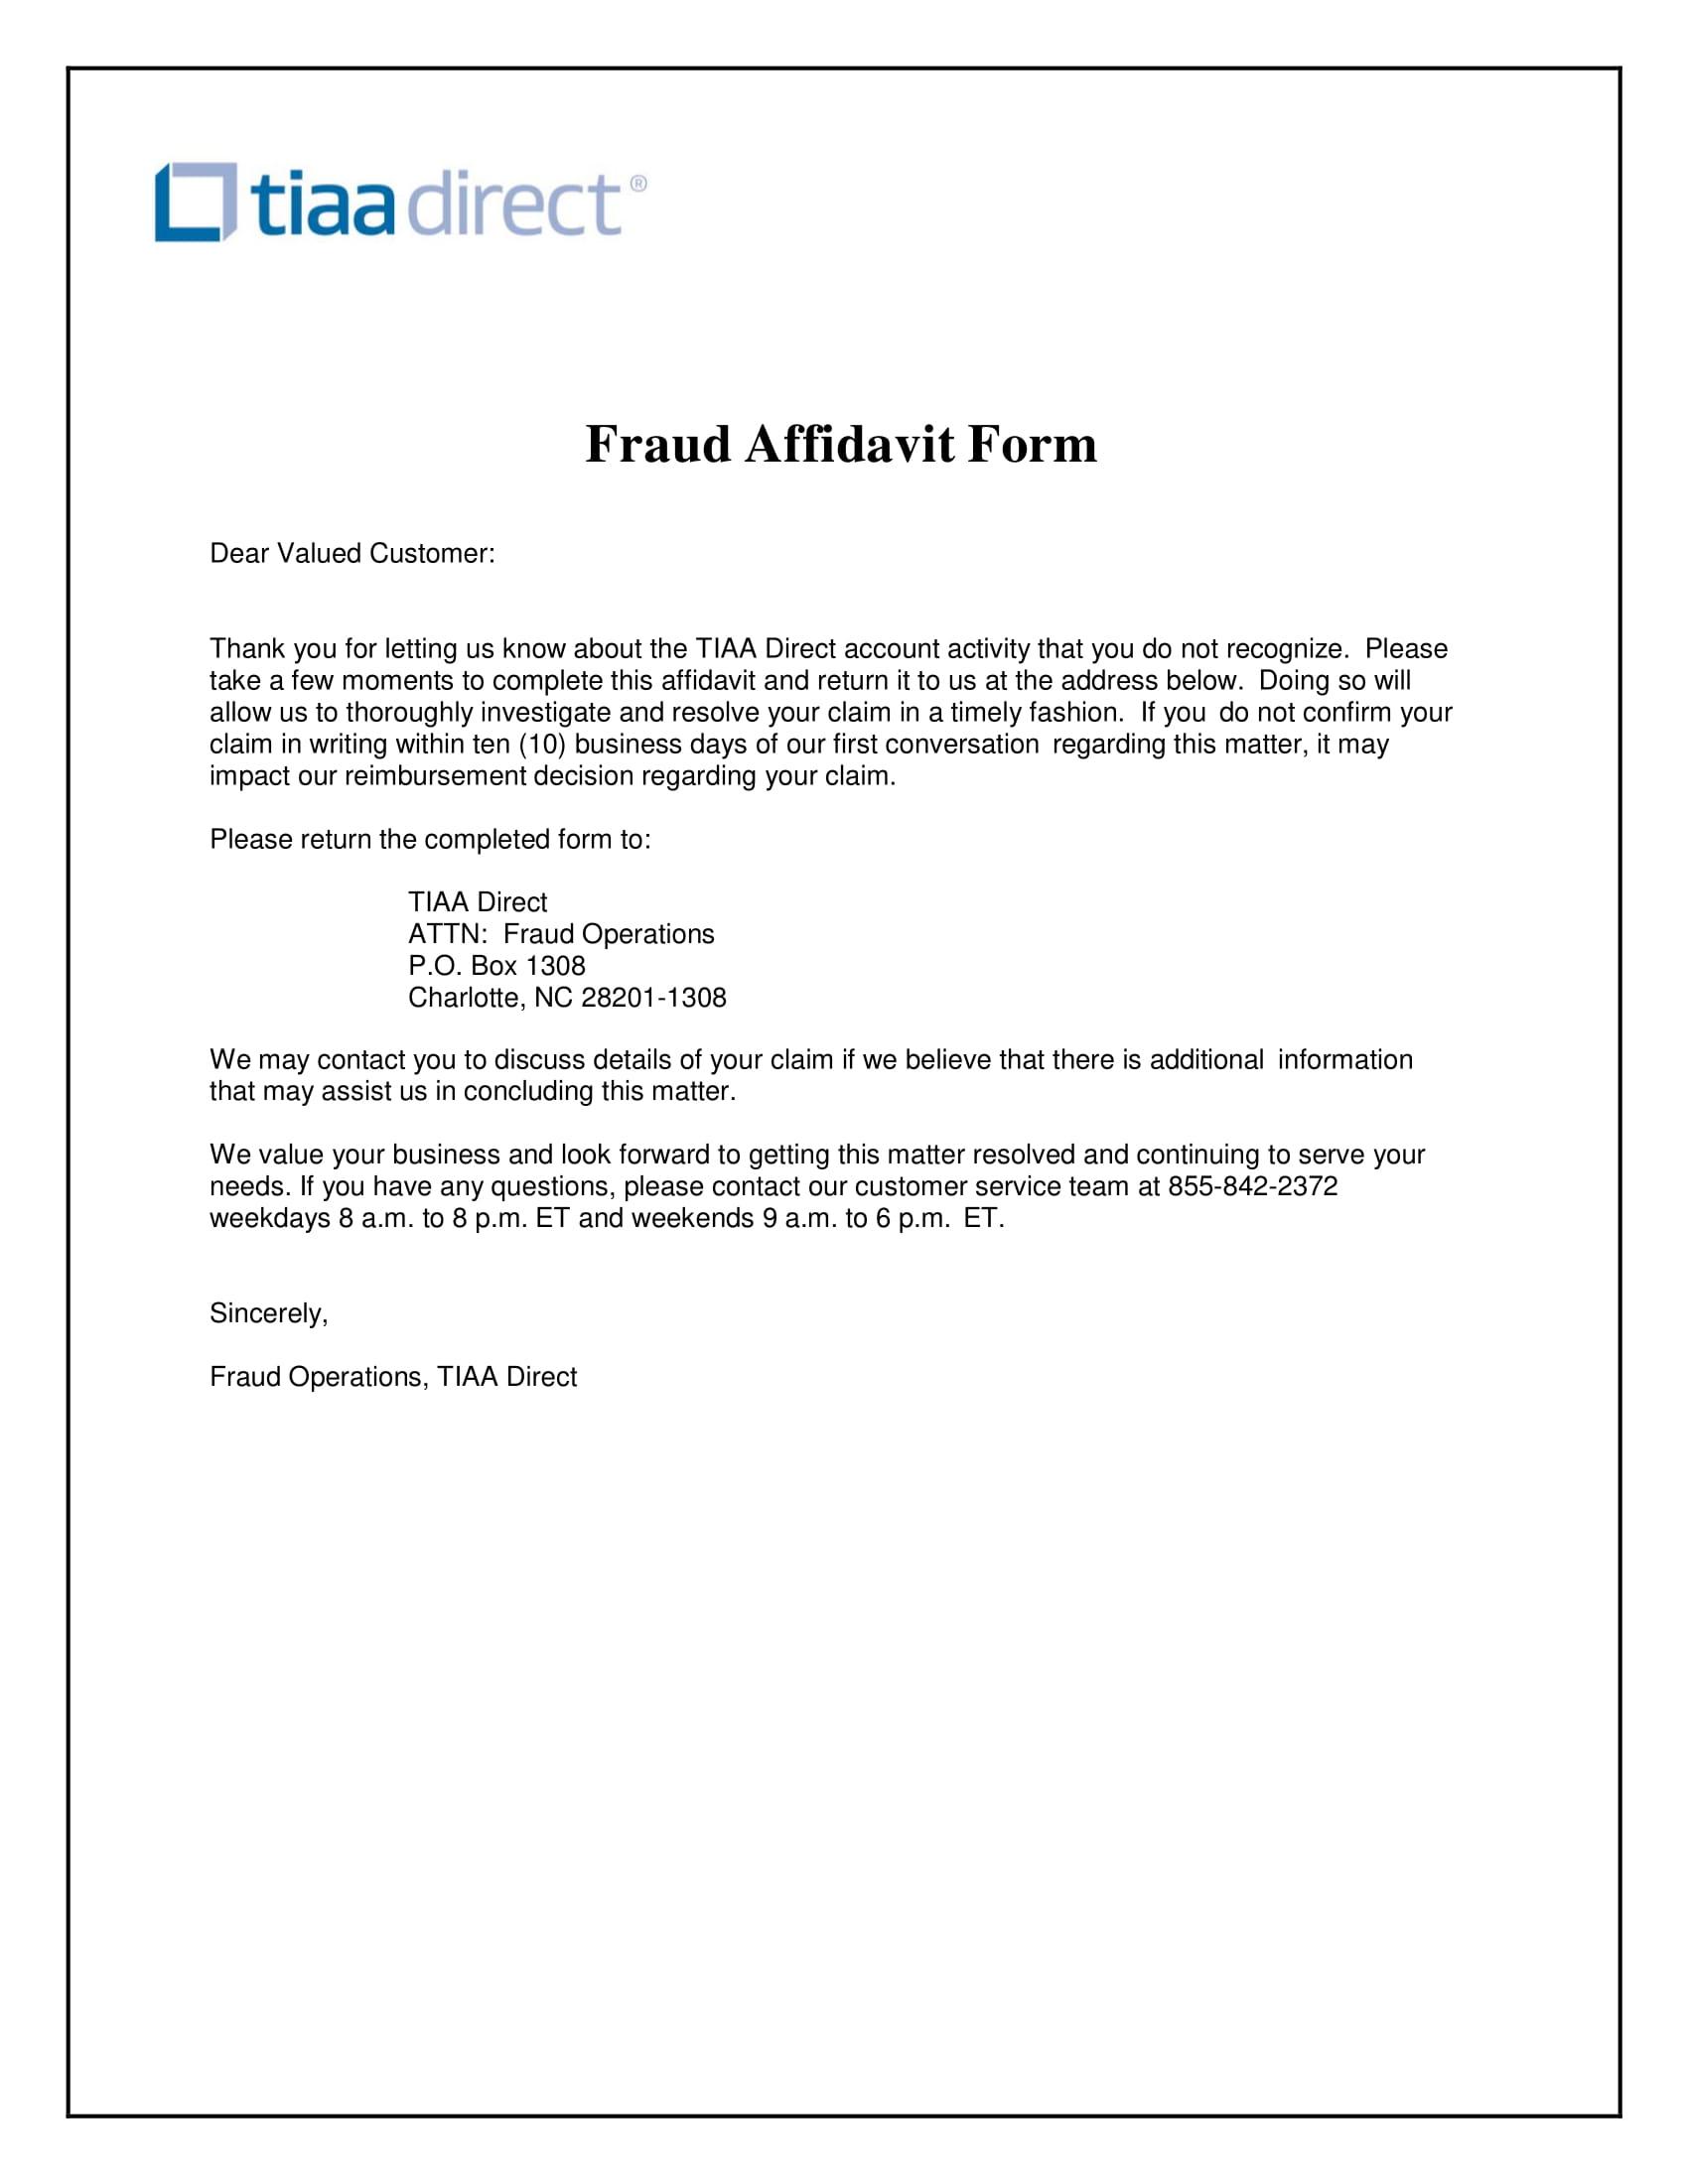 affidavit form fraud